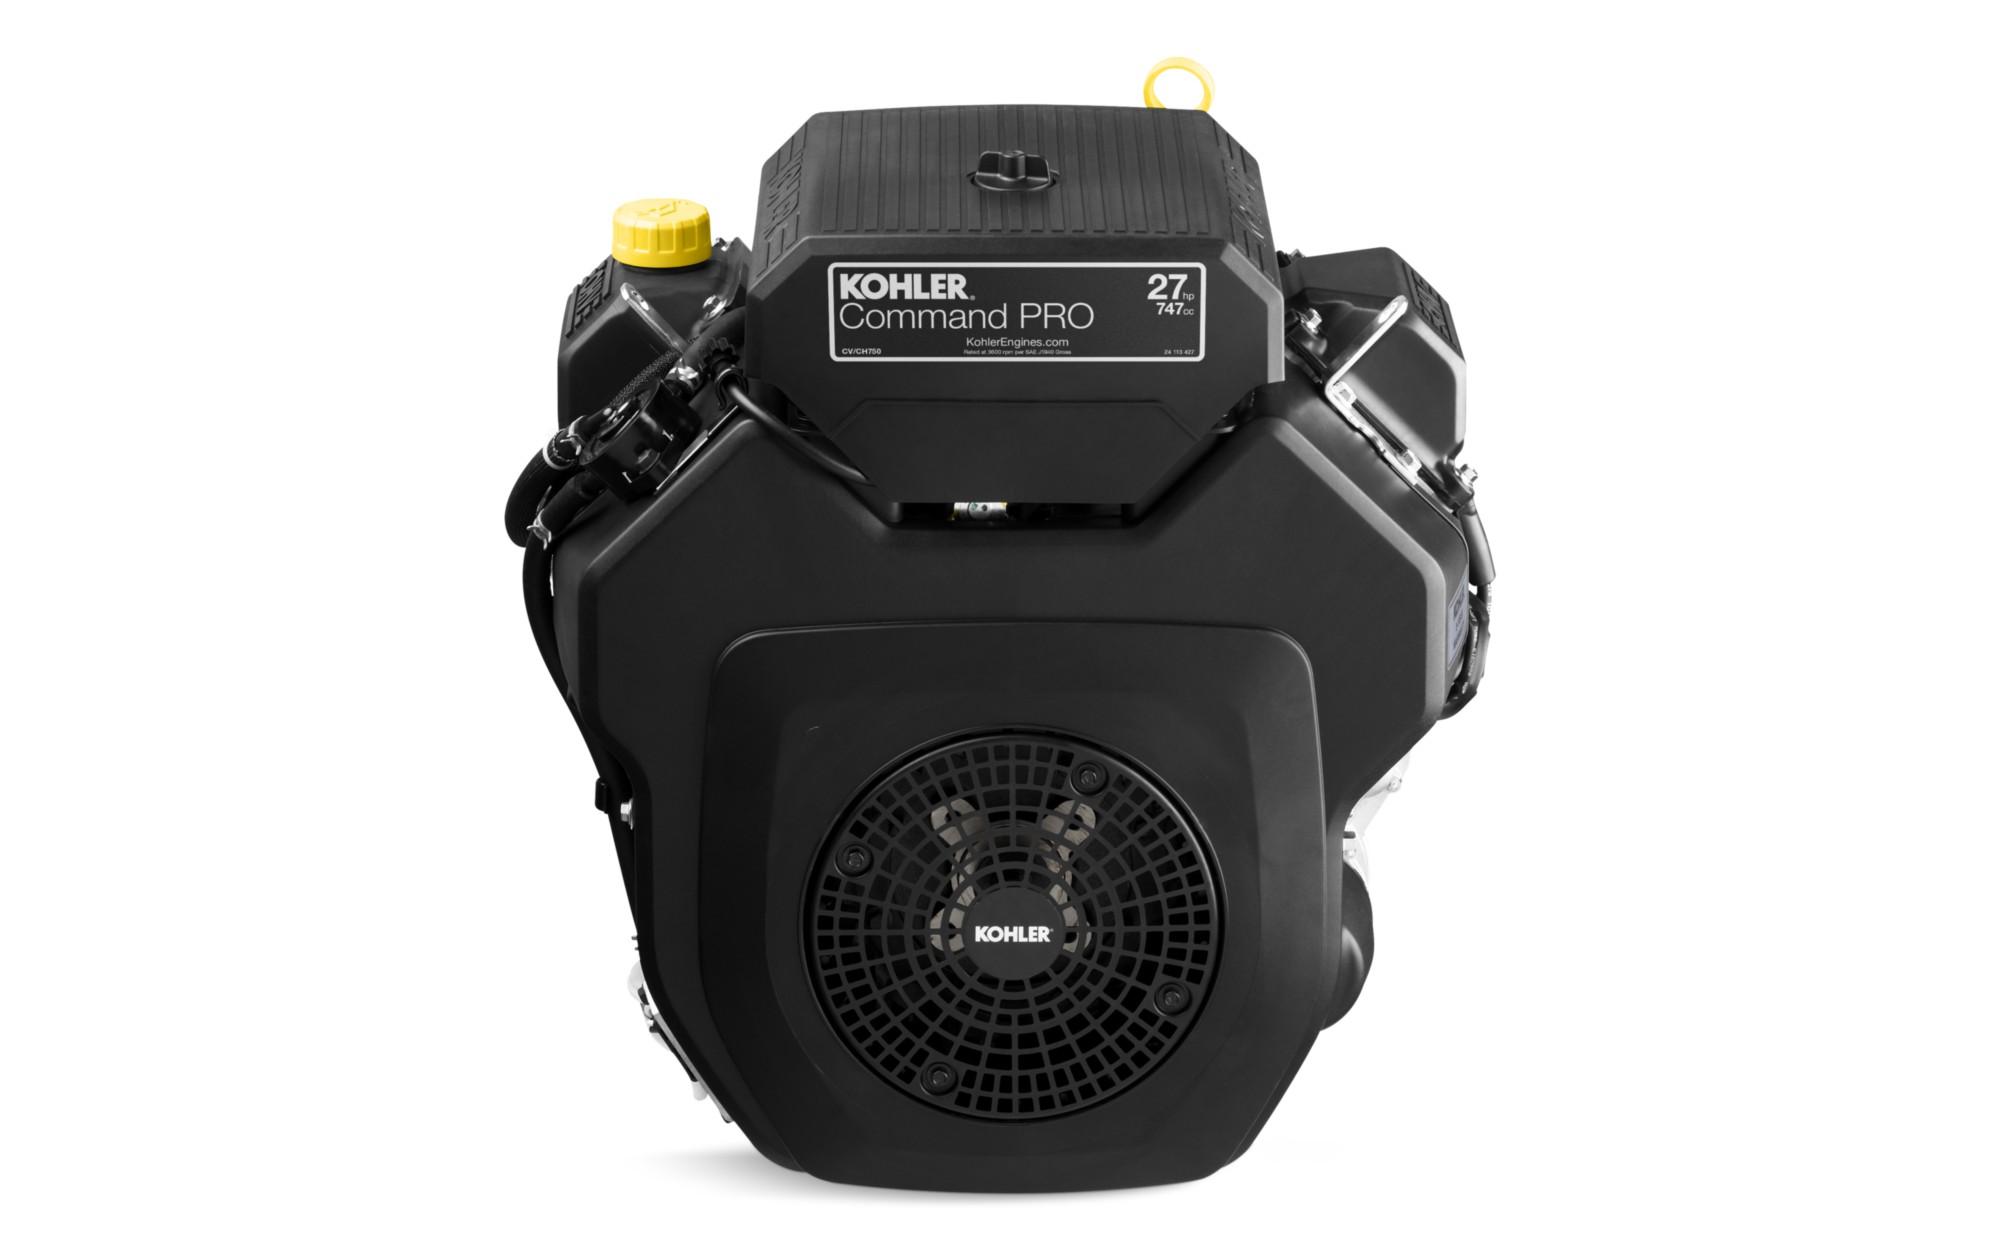 Ch750 Command Pro Kohler Engine Electrical Diagram Economy